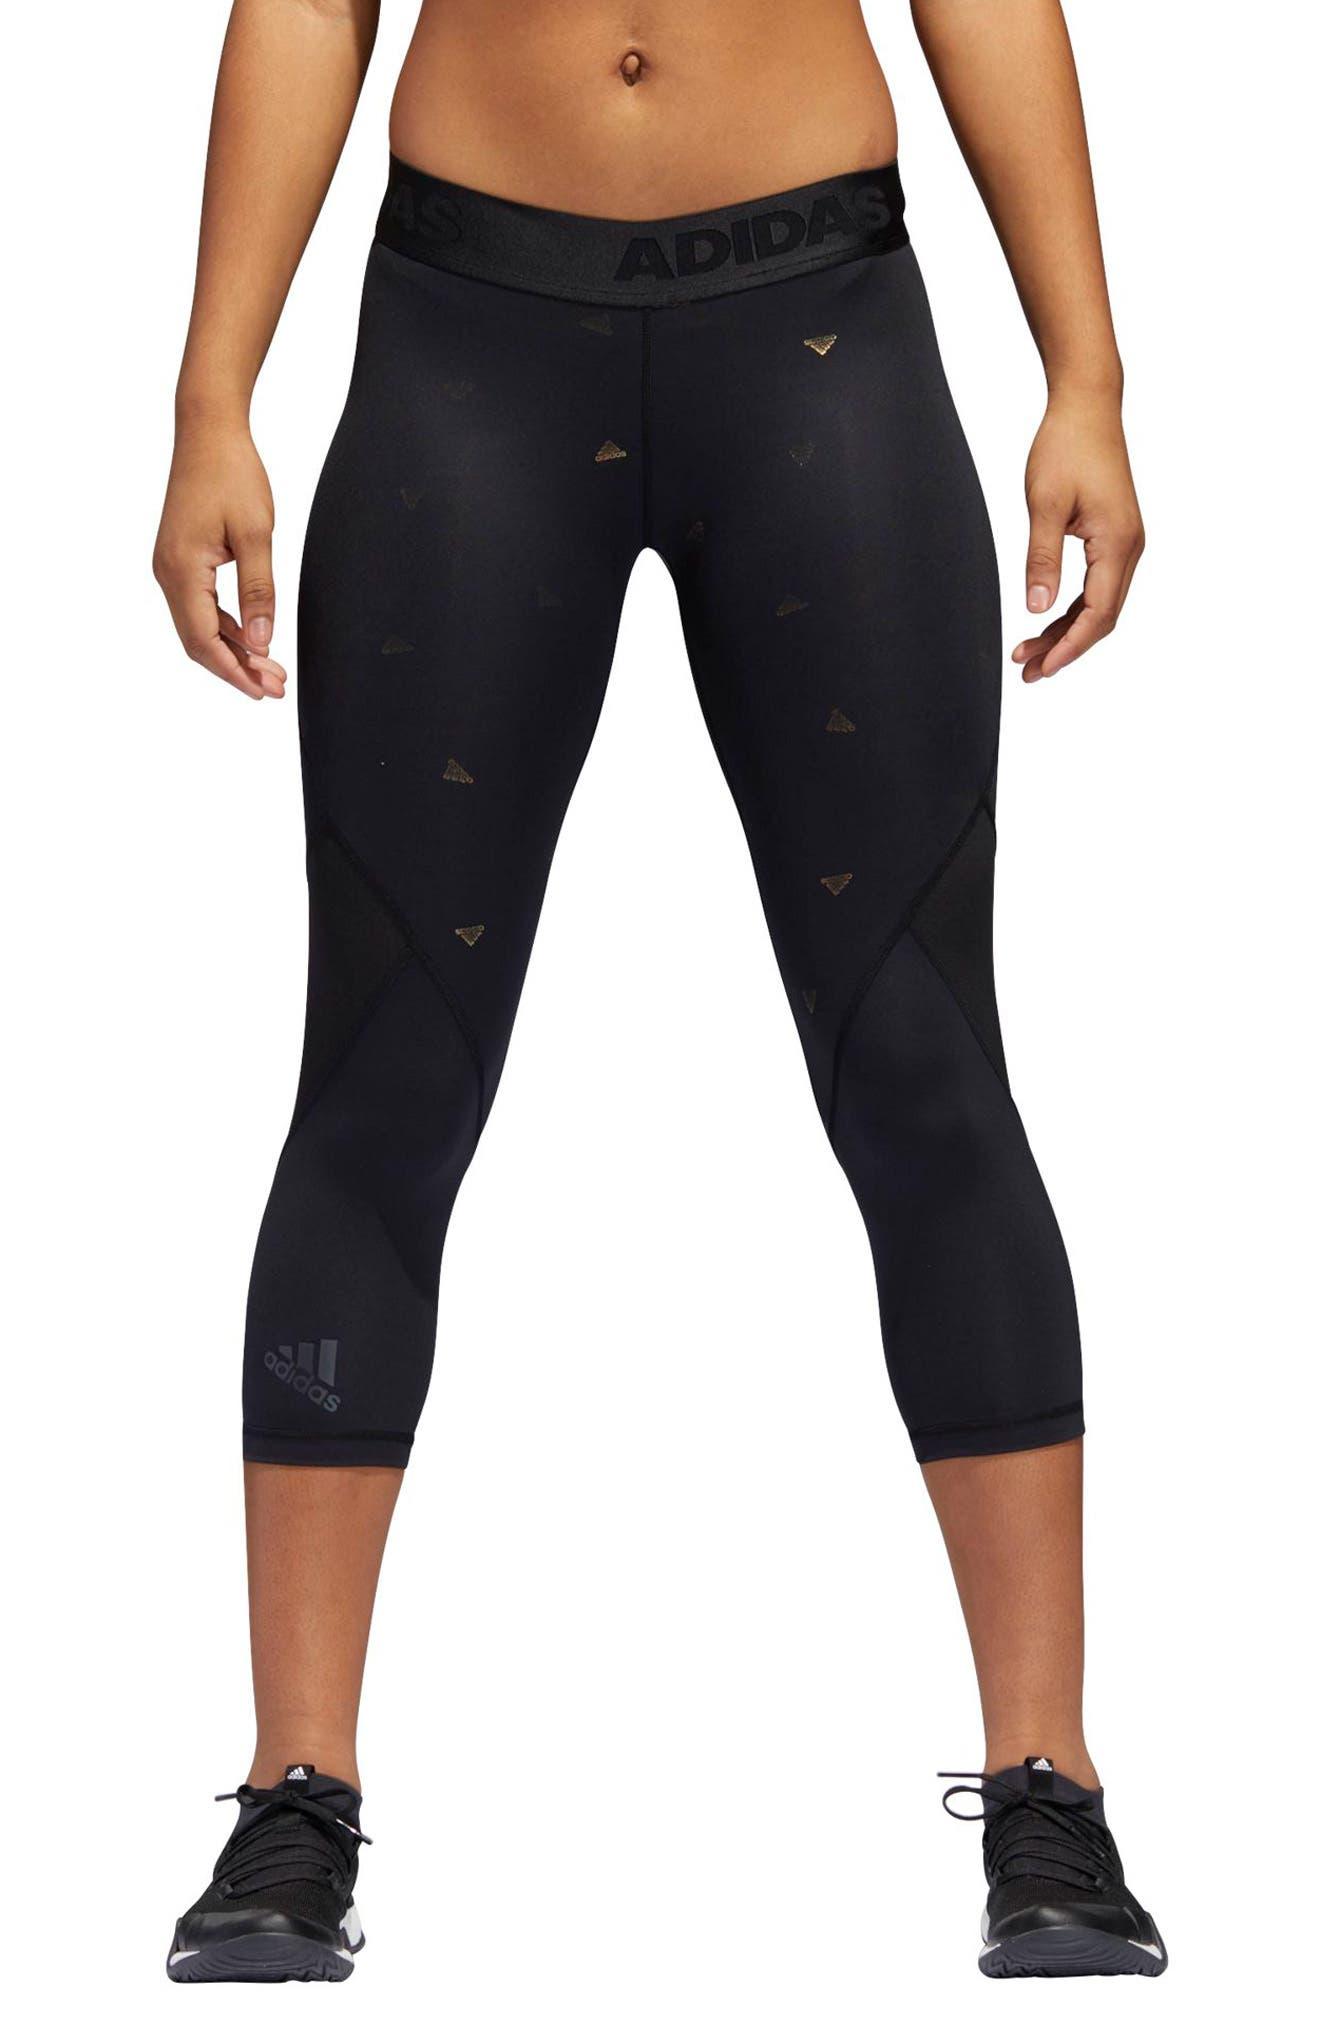 Alphaskin Sport Capri Leggings,                         Main,                         color, Black / Print